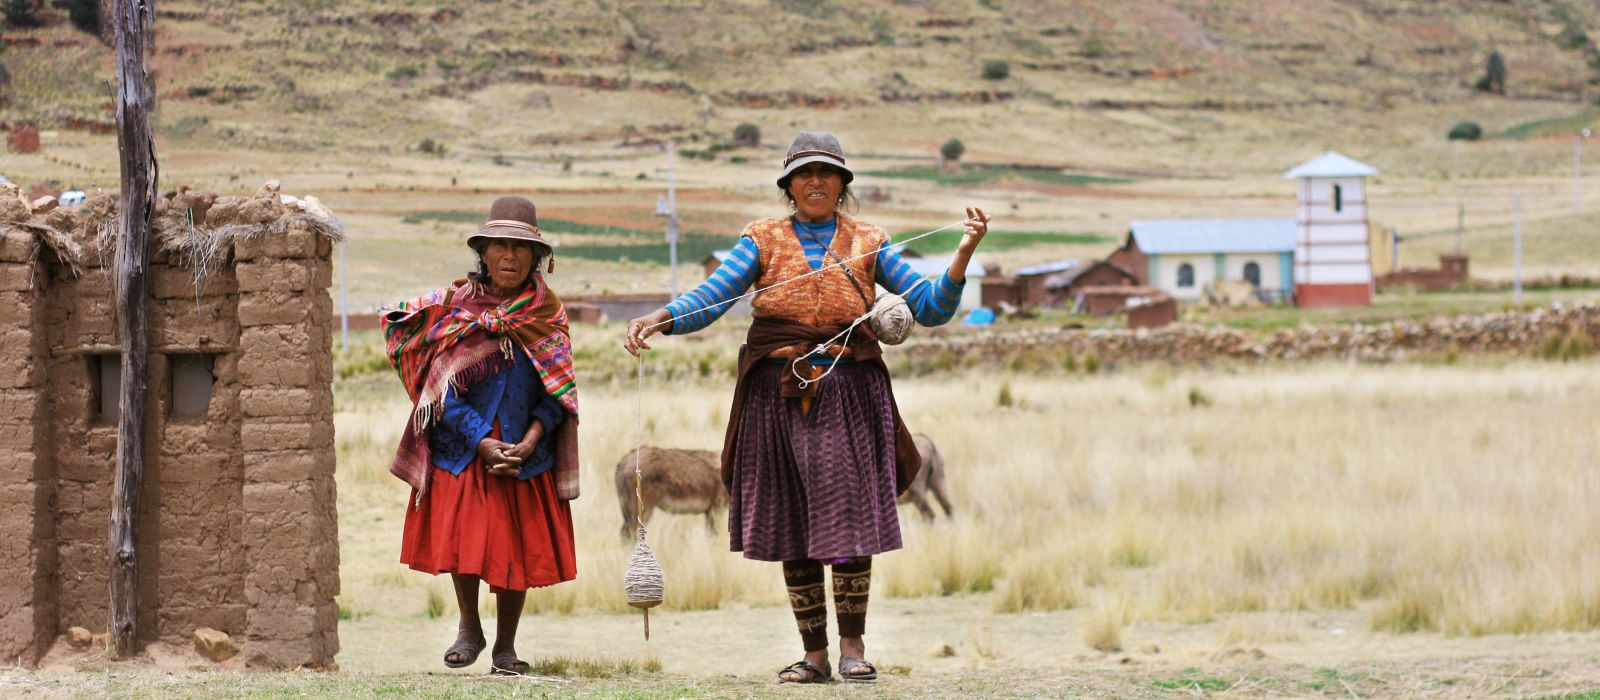 Aymara women, Chile, South America